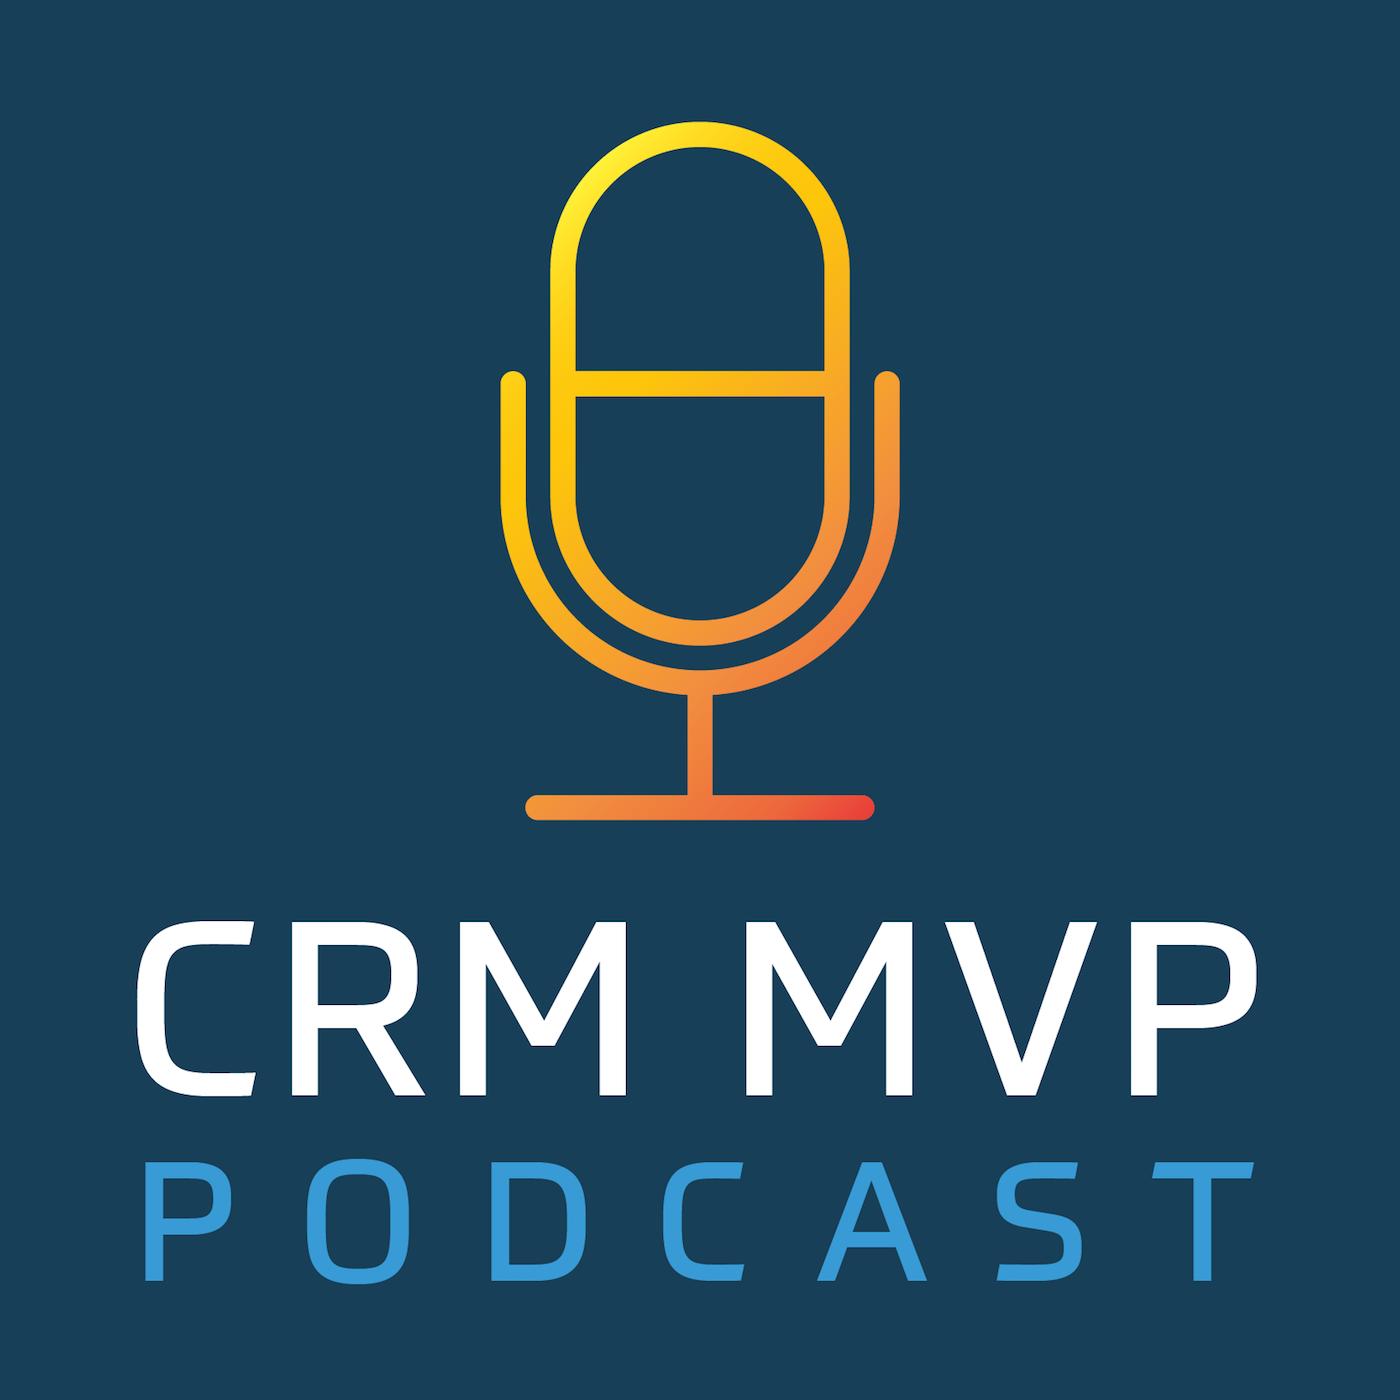 CRM MVP Podcast show art